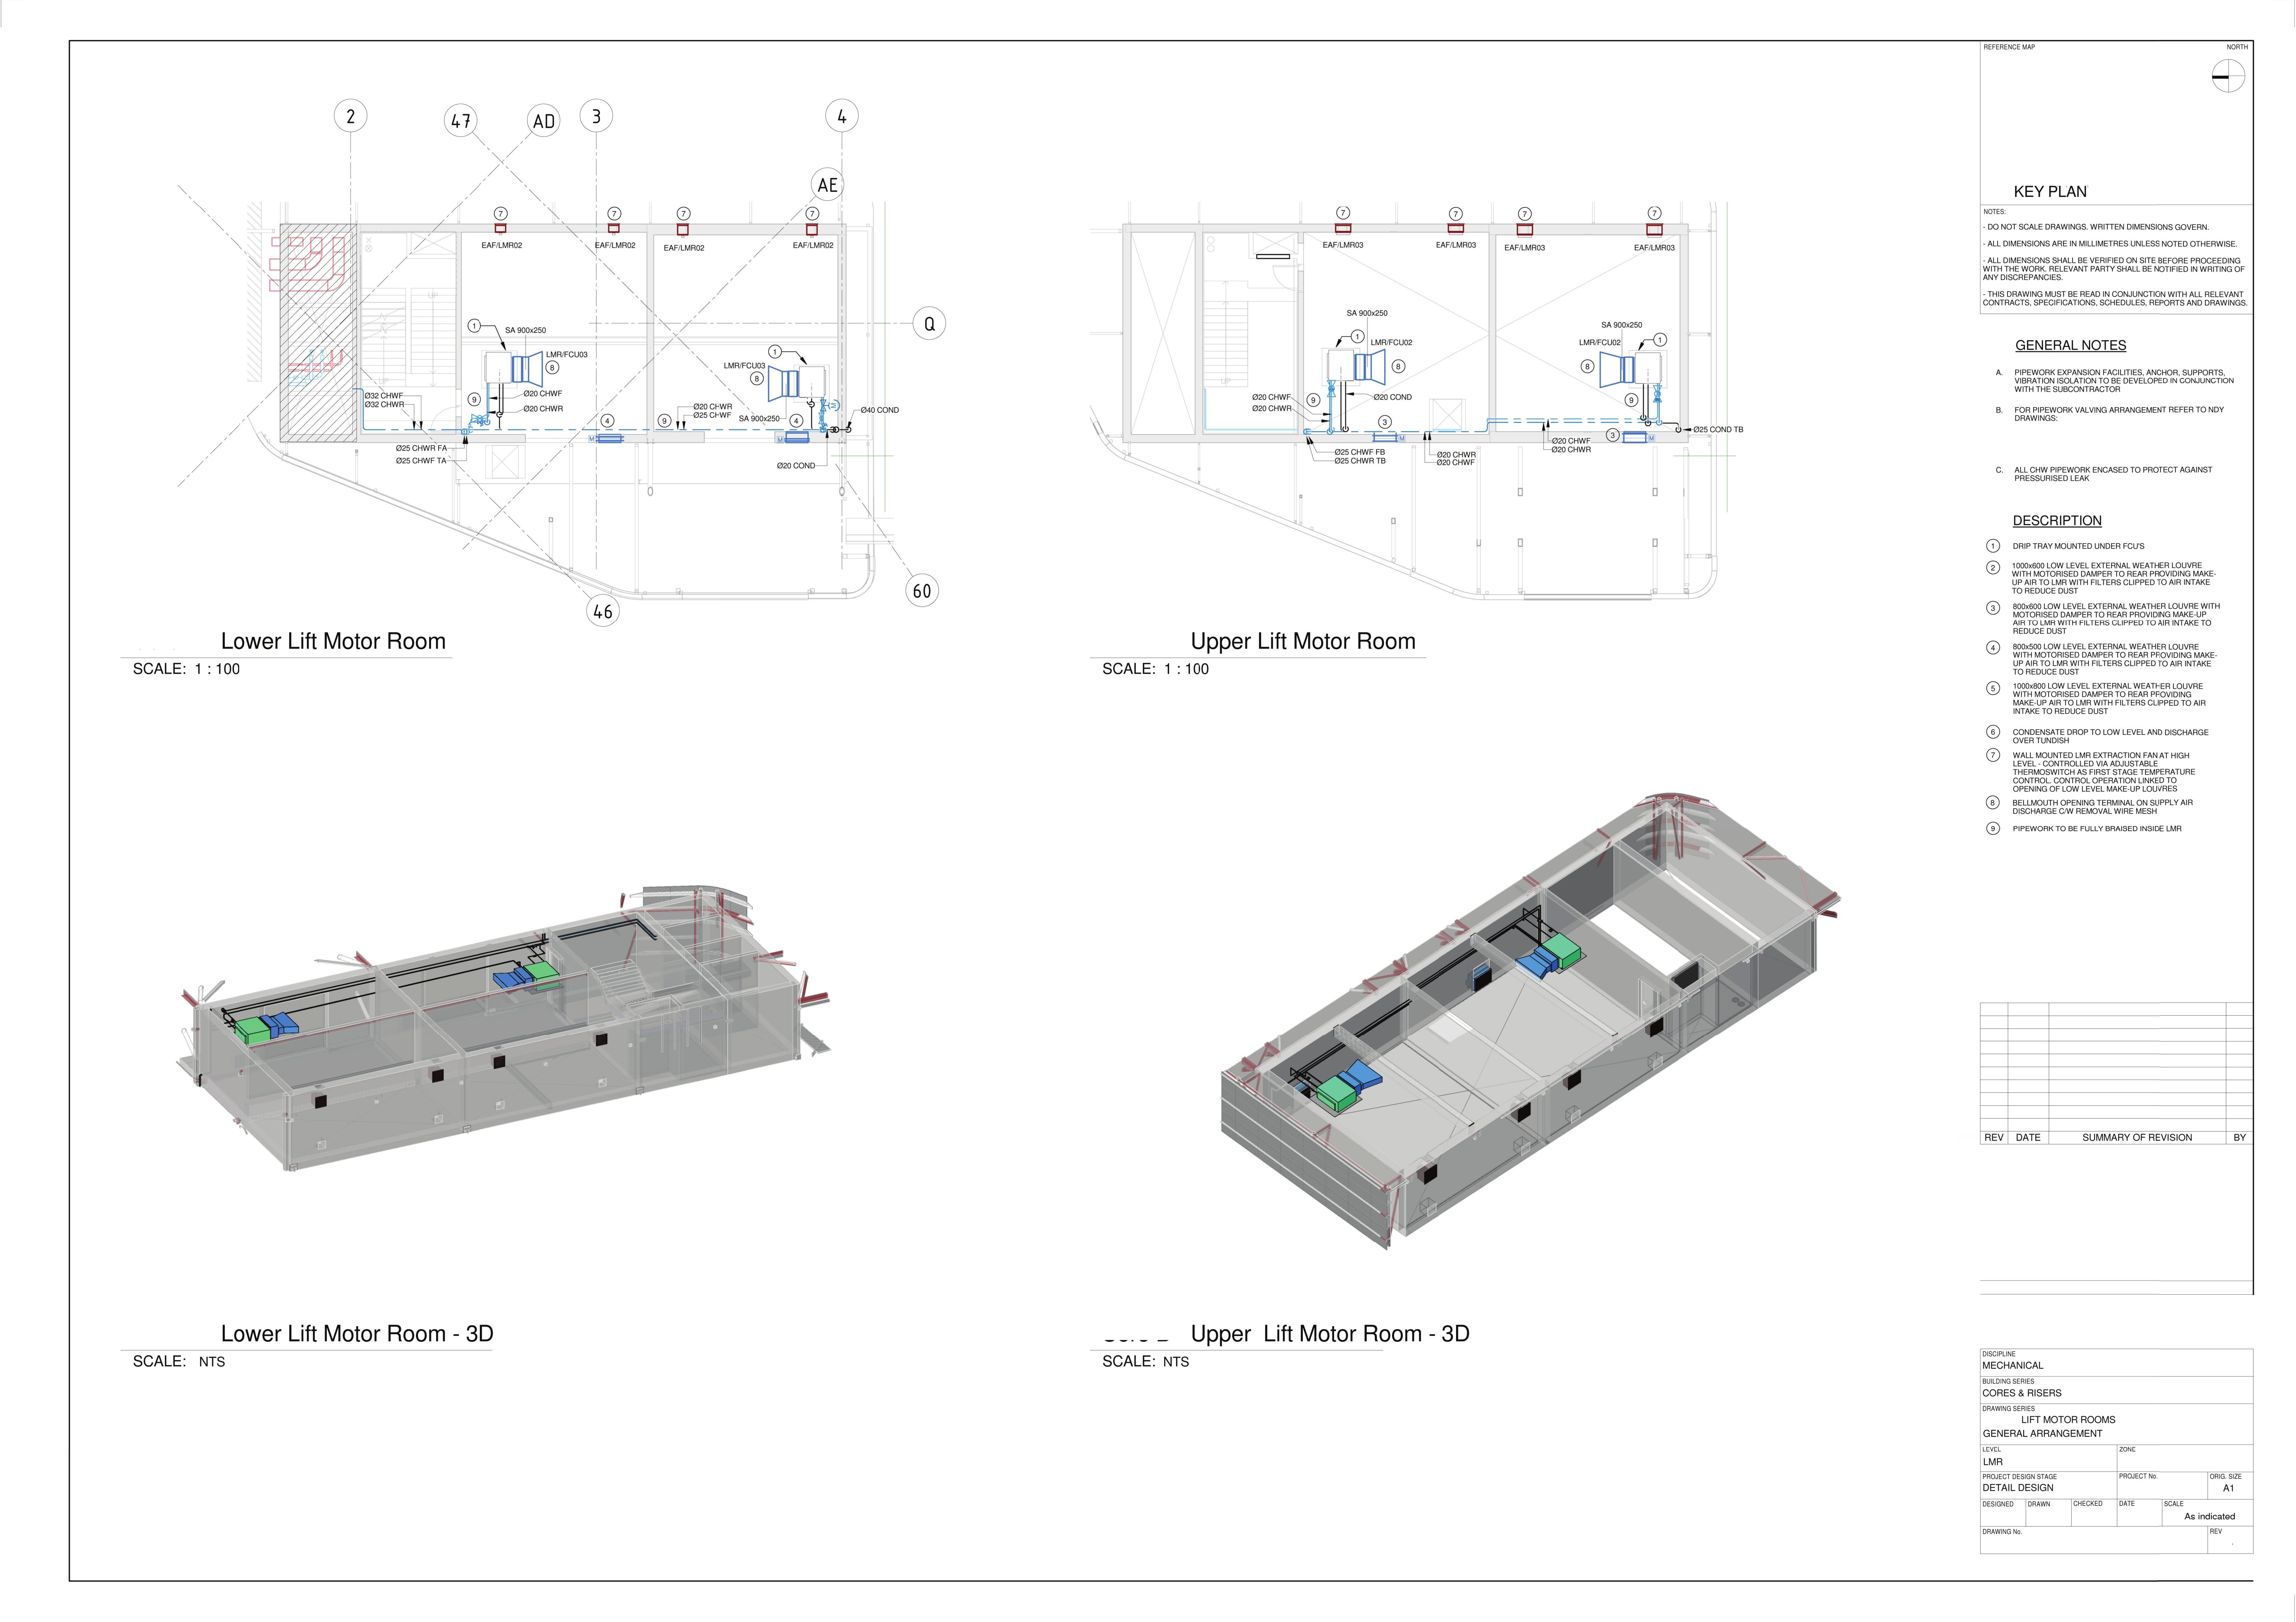 Lift Motor Rooms General Arrangement 2